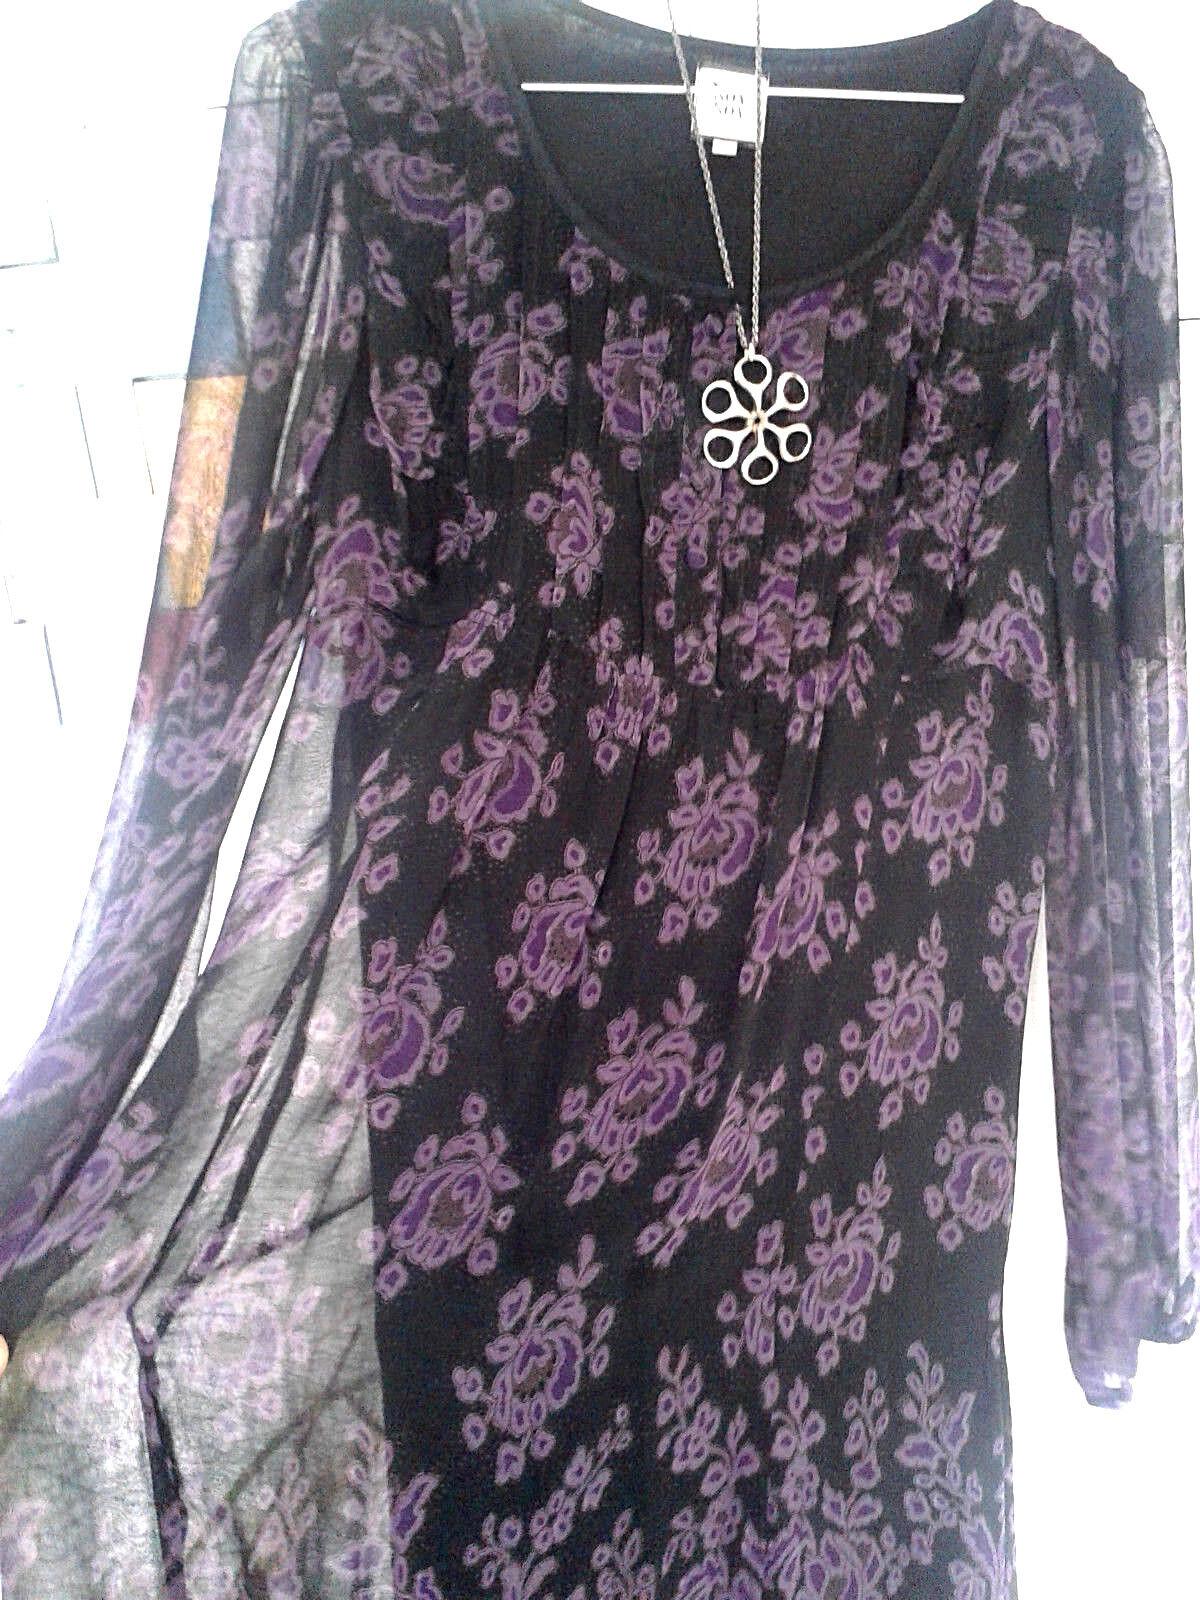 NOA NOA bezauberndes  Kleid Schwarz Lila Blaumenmuster 100% Viskose Gr. S M  G138